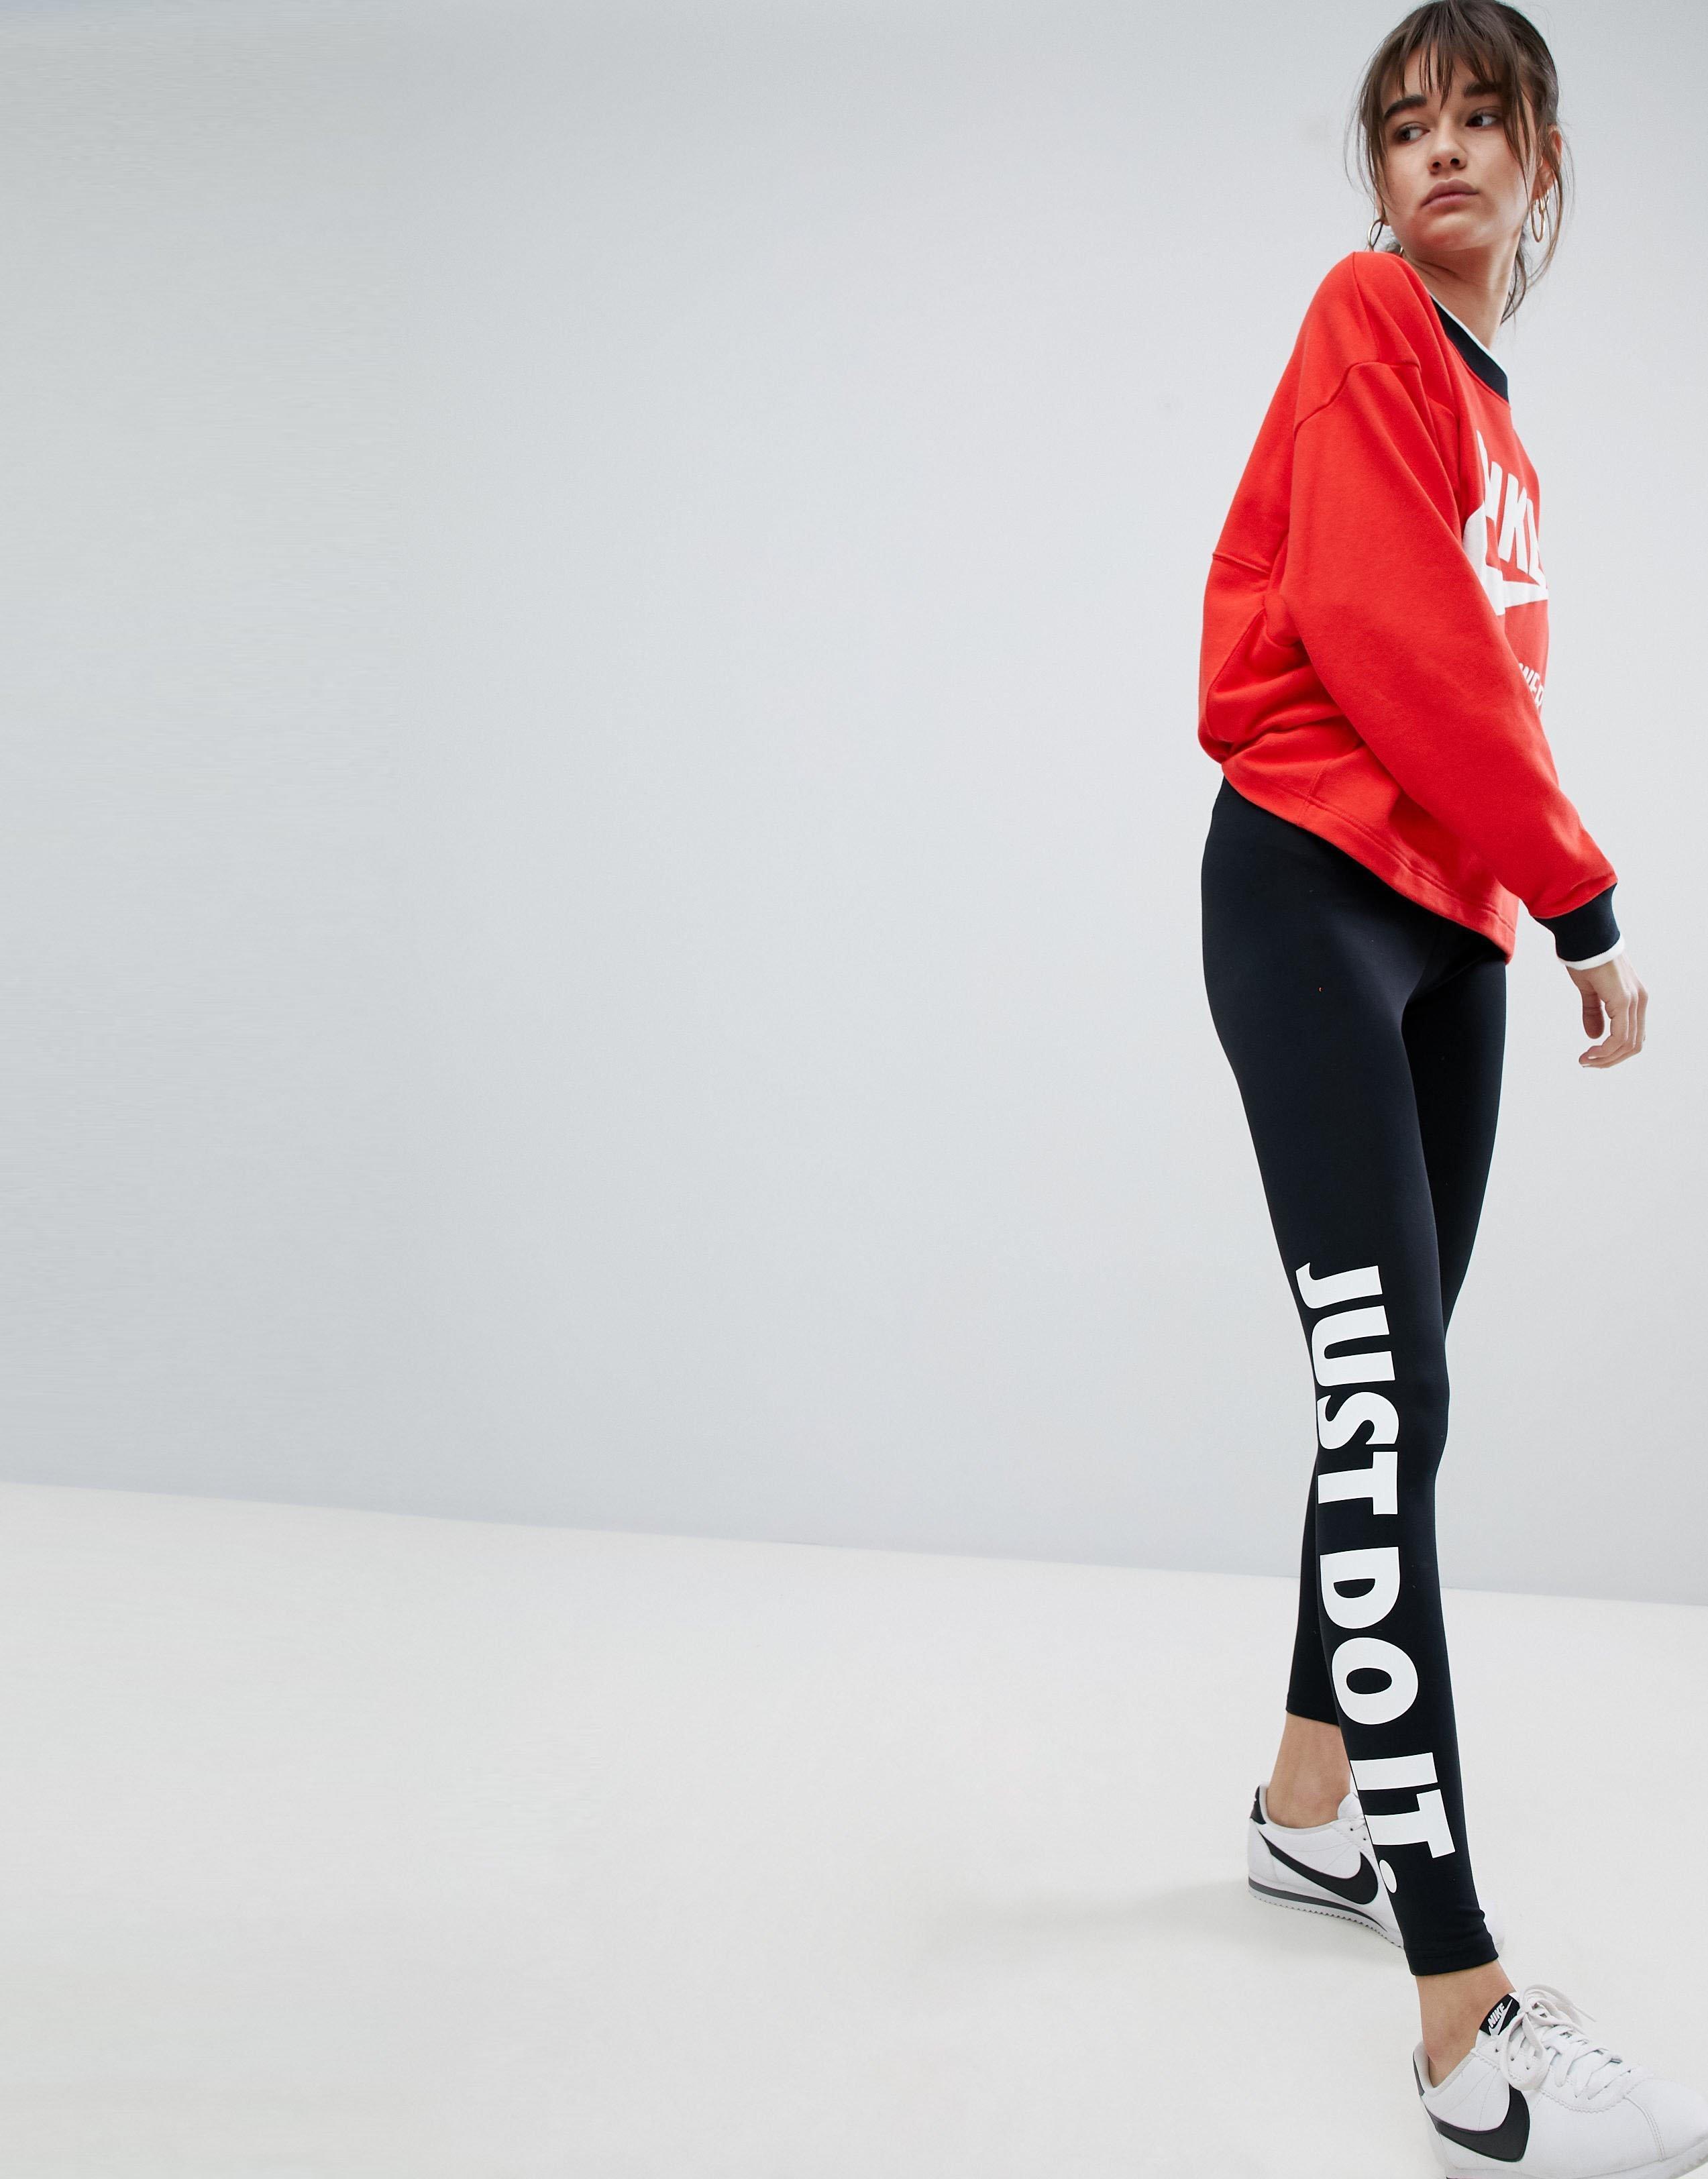 Nike☆JUST DO IT サイドロゴ レギンスカラー写真01